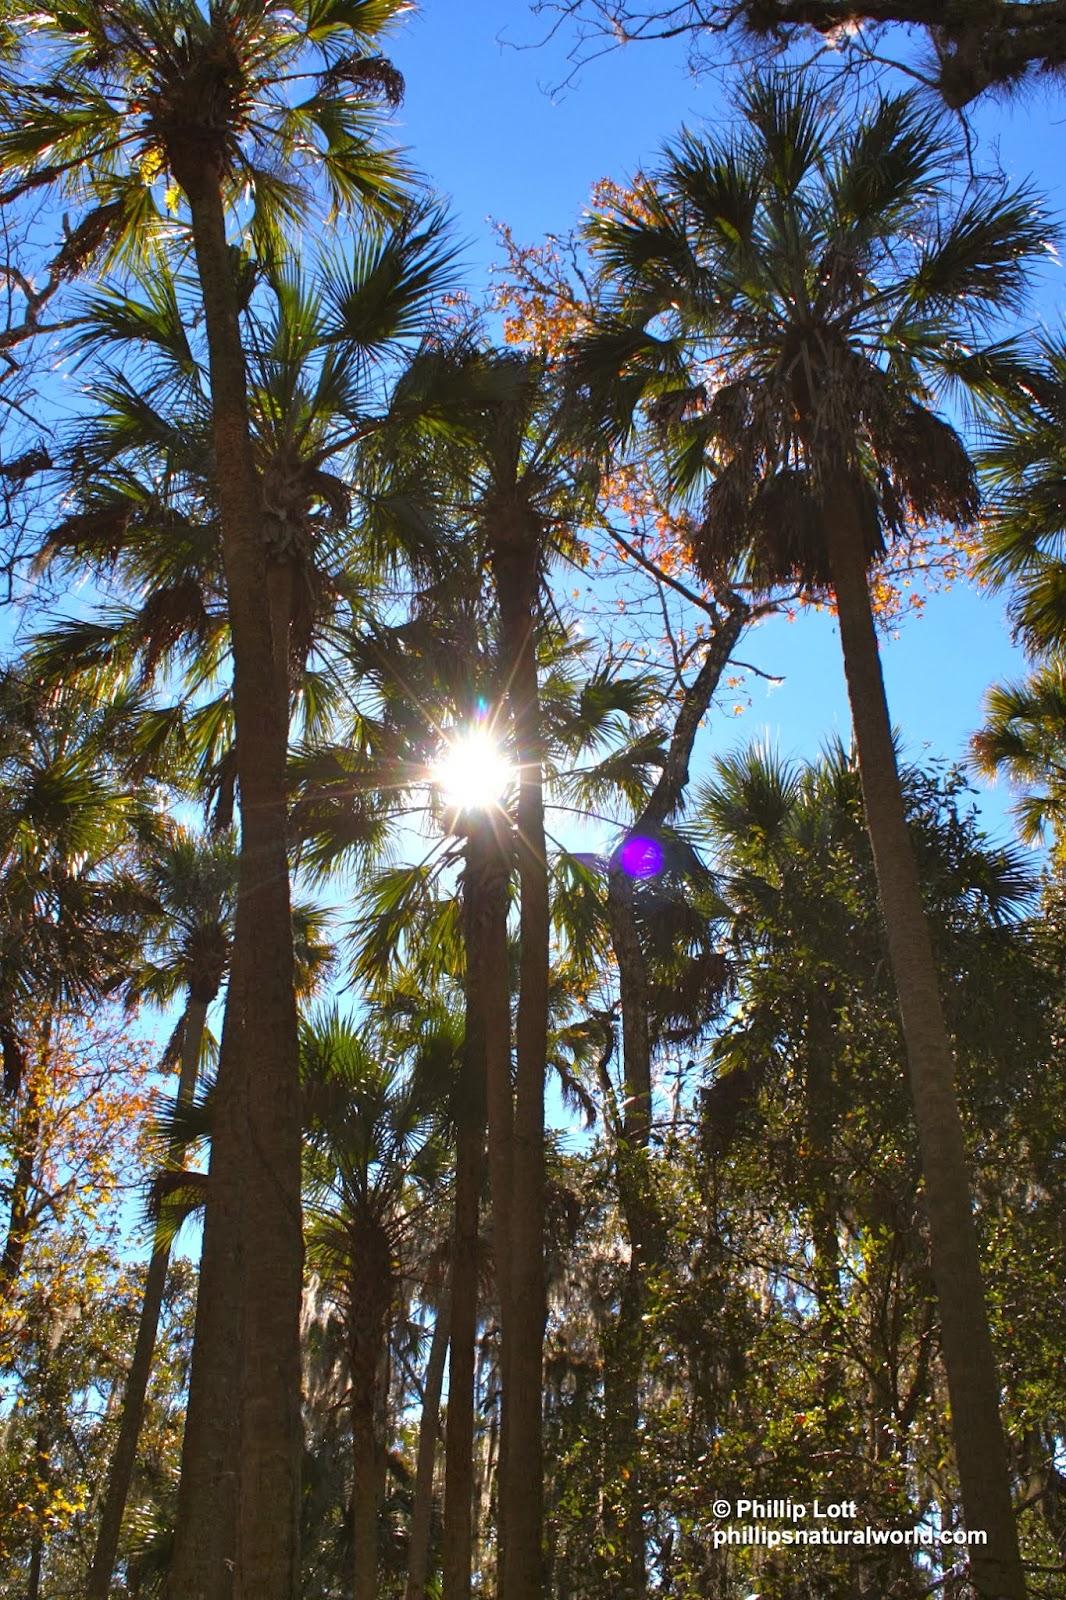 Orange Park Mall >> 238 Florida Manatees - Phillip's Natural World